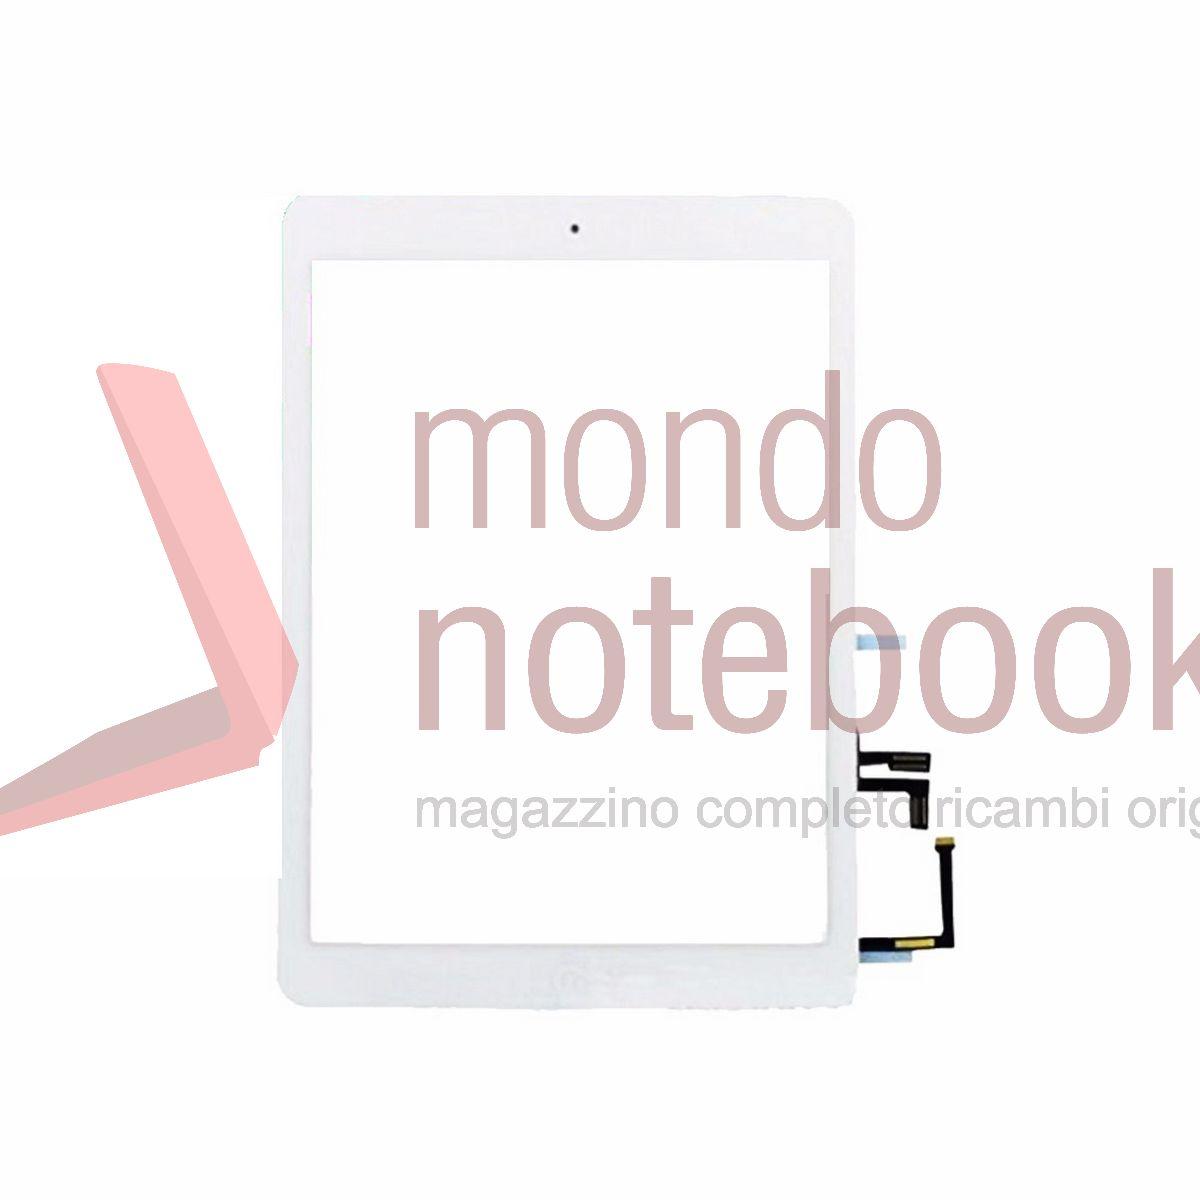 https://www.mondonotebook.it/3218/vetro-touch-screen-apple-ipad-air-bianco-white-touchscreen.jpg